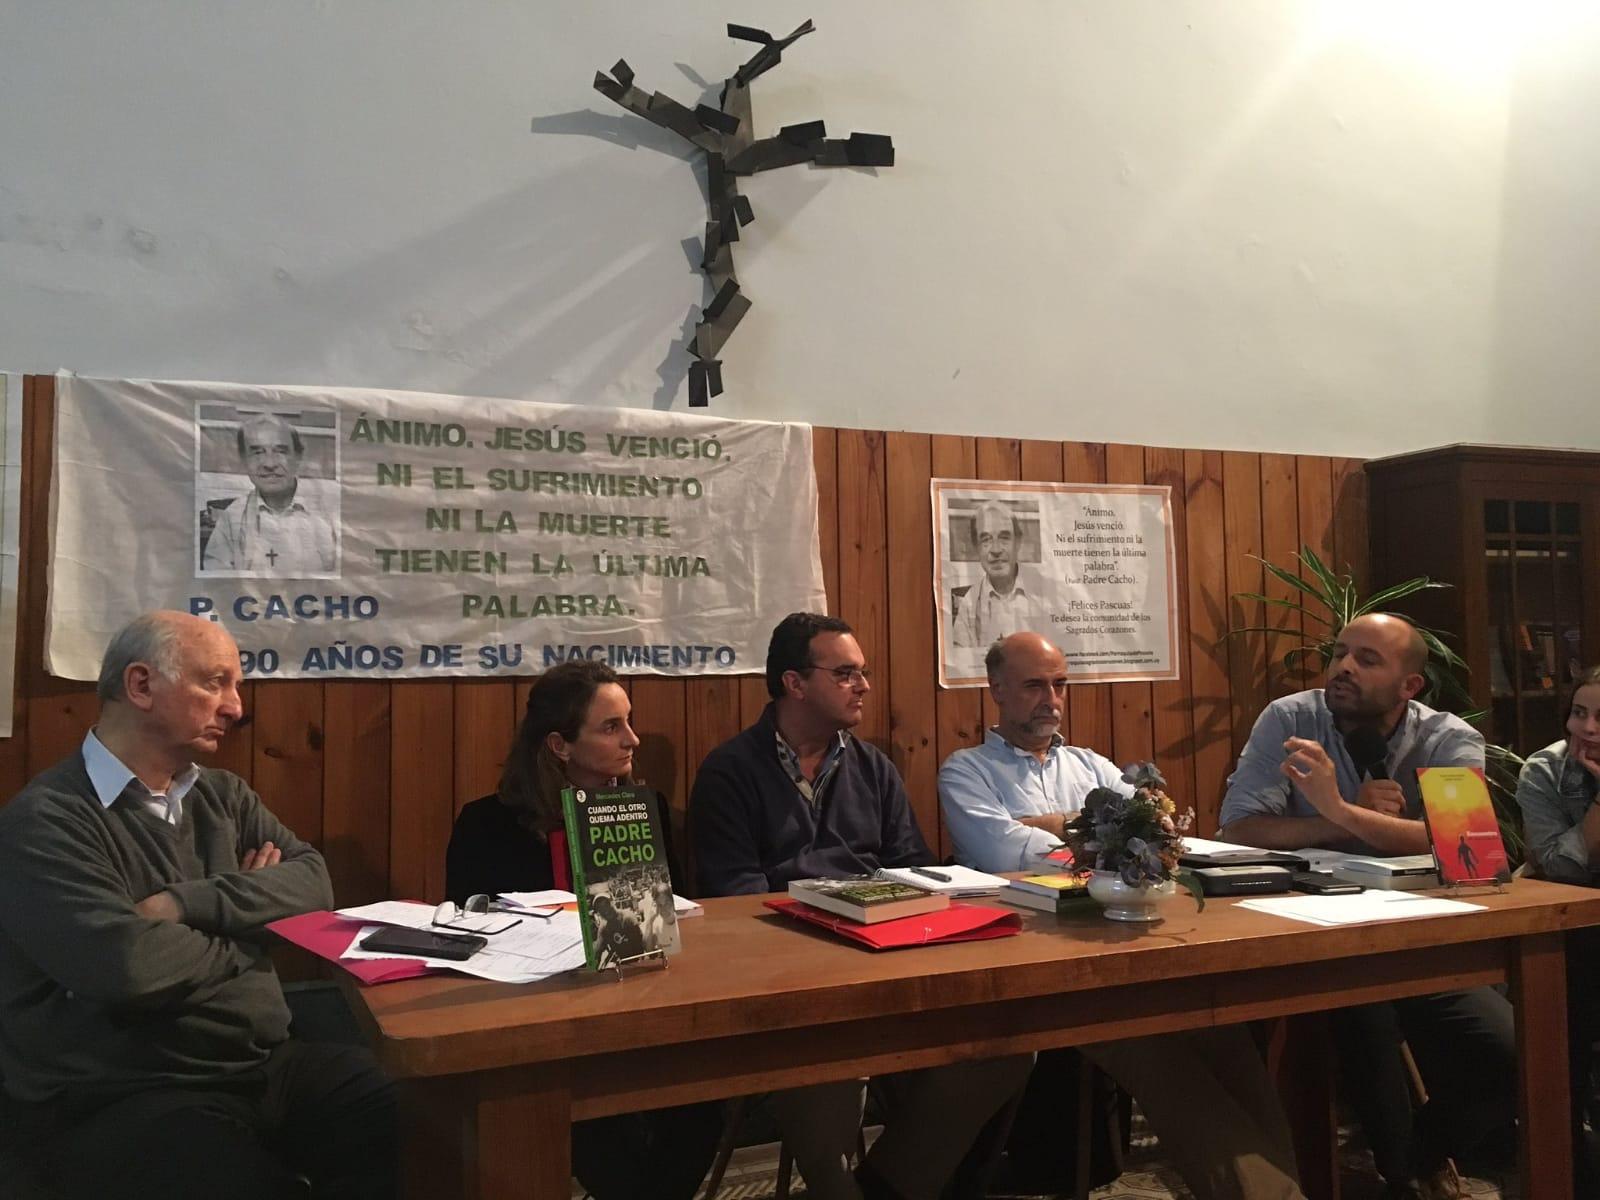 P. Pablo Bonavía, Carmen Sanguinetti, Pablo Bartol, Pablo Mieres y Matías Rodríguez